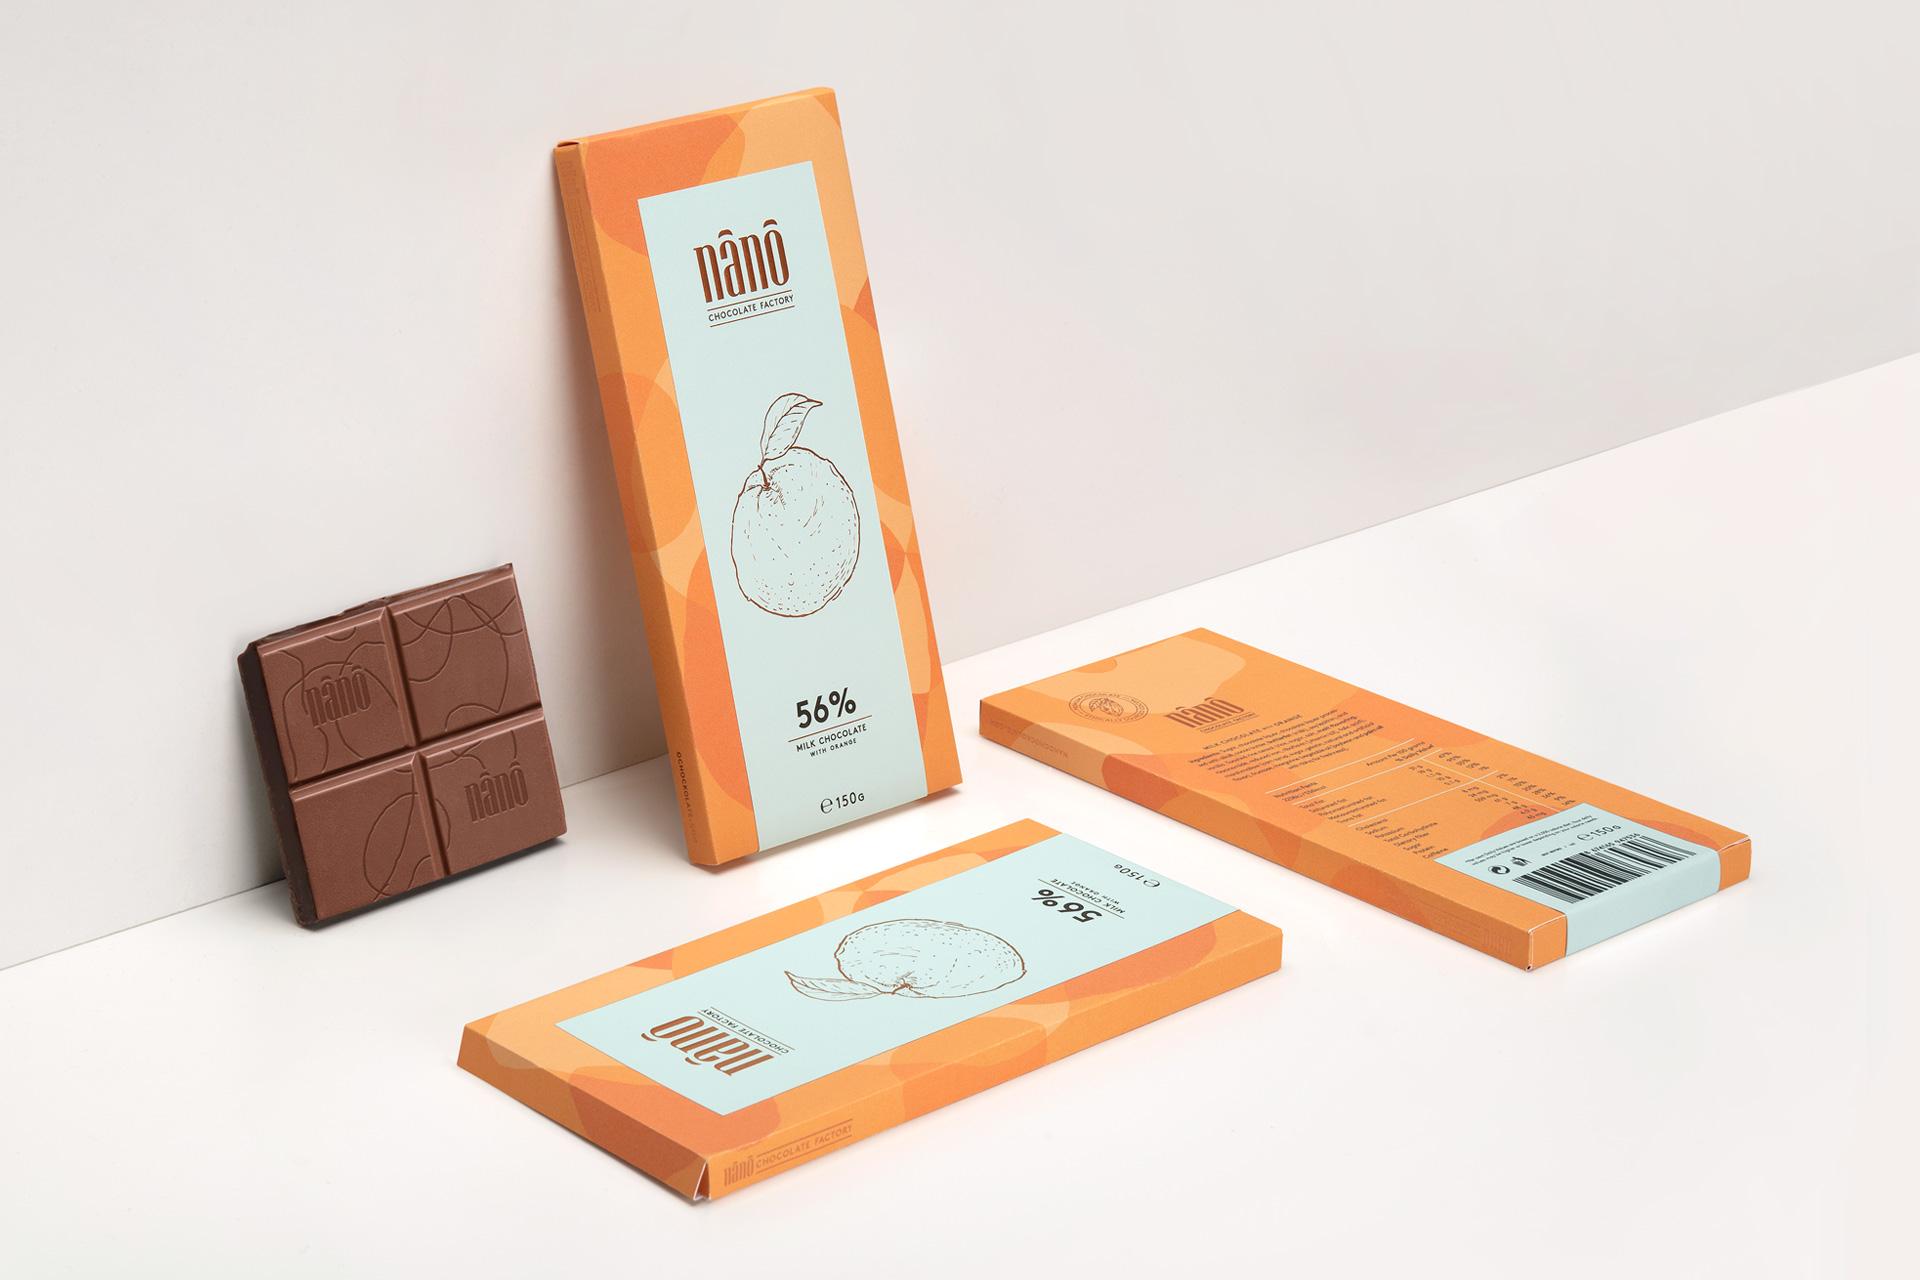 Nano package design